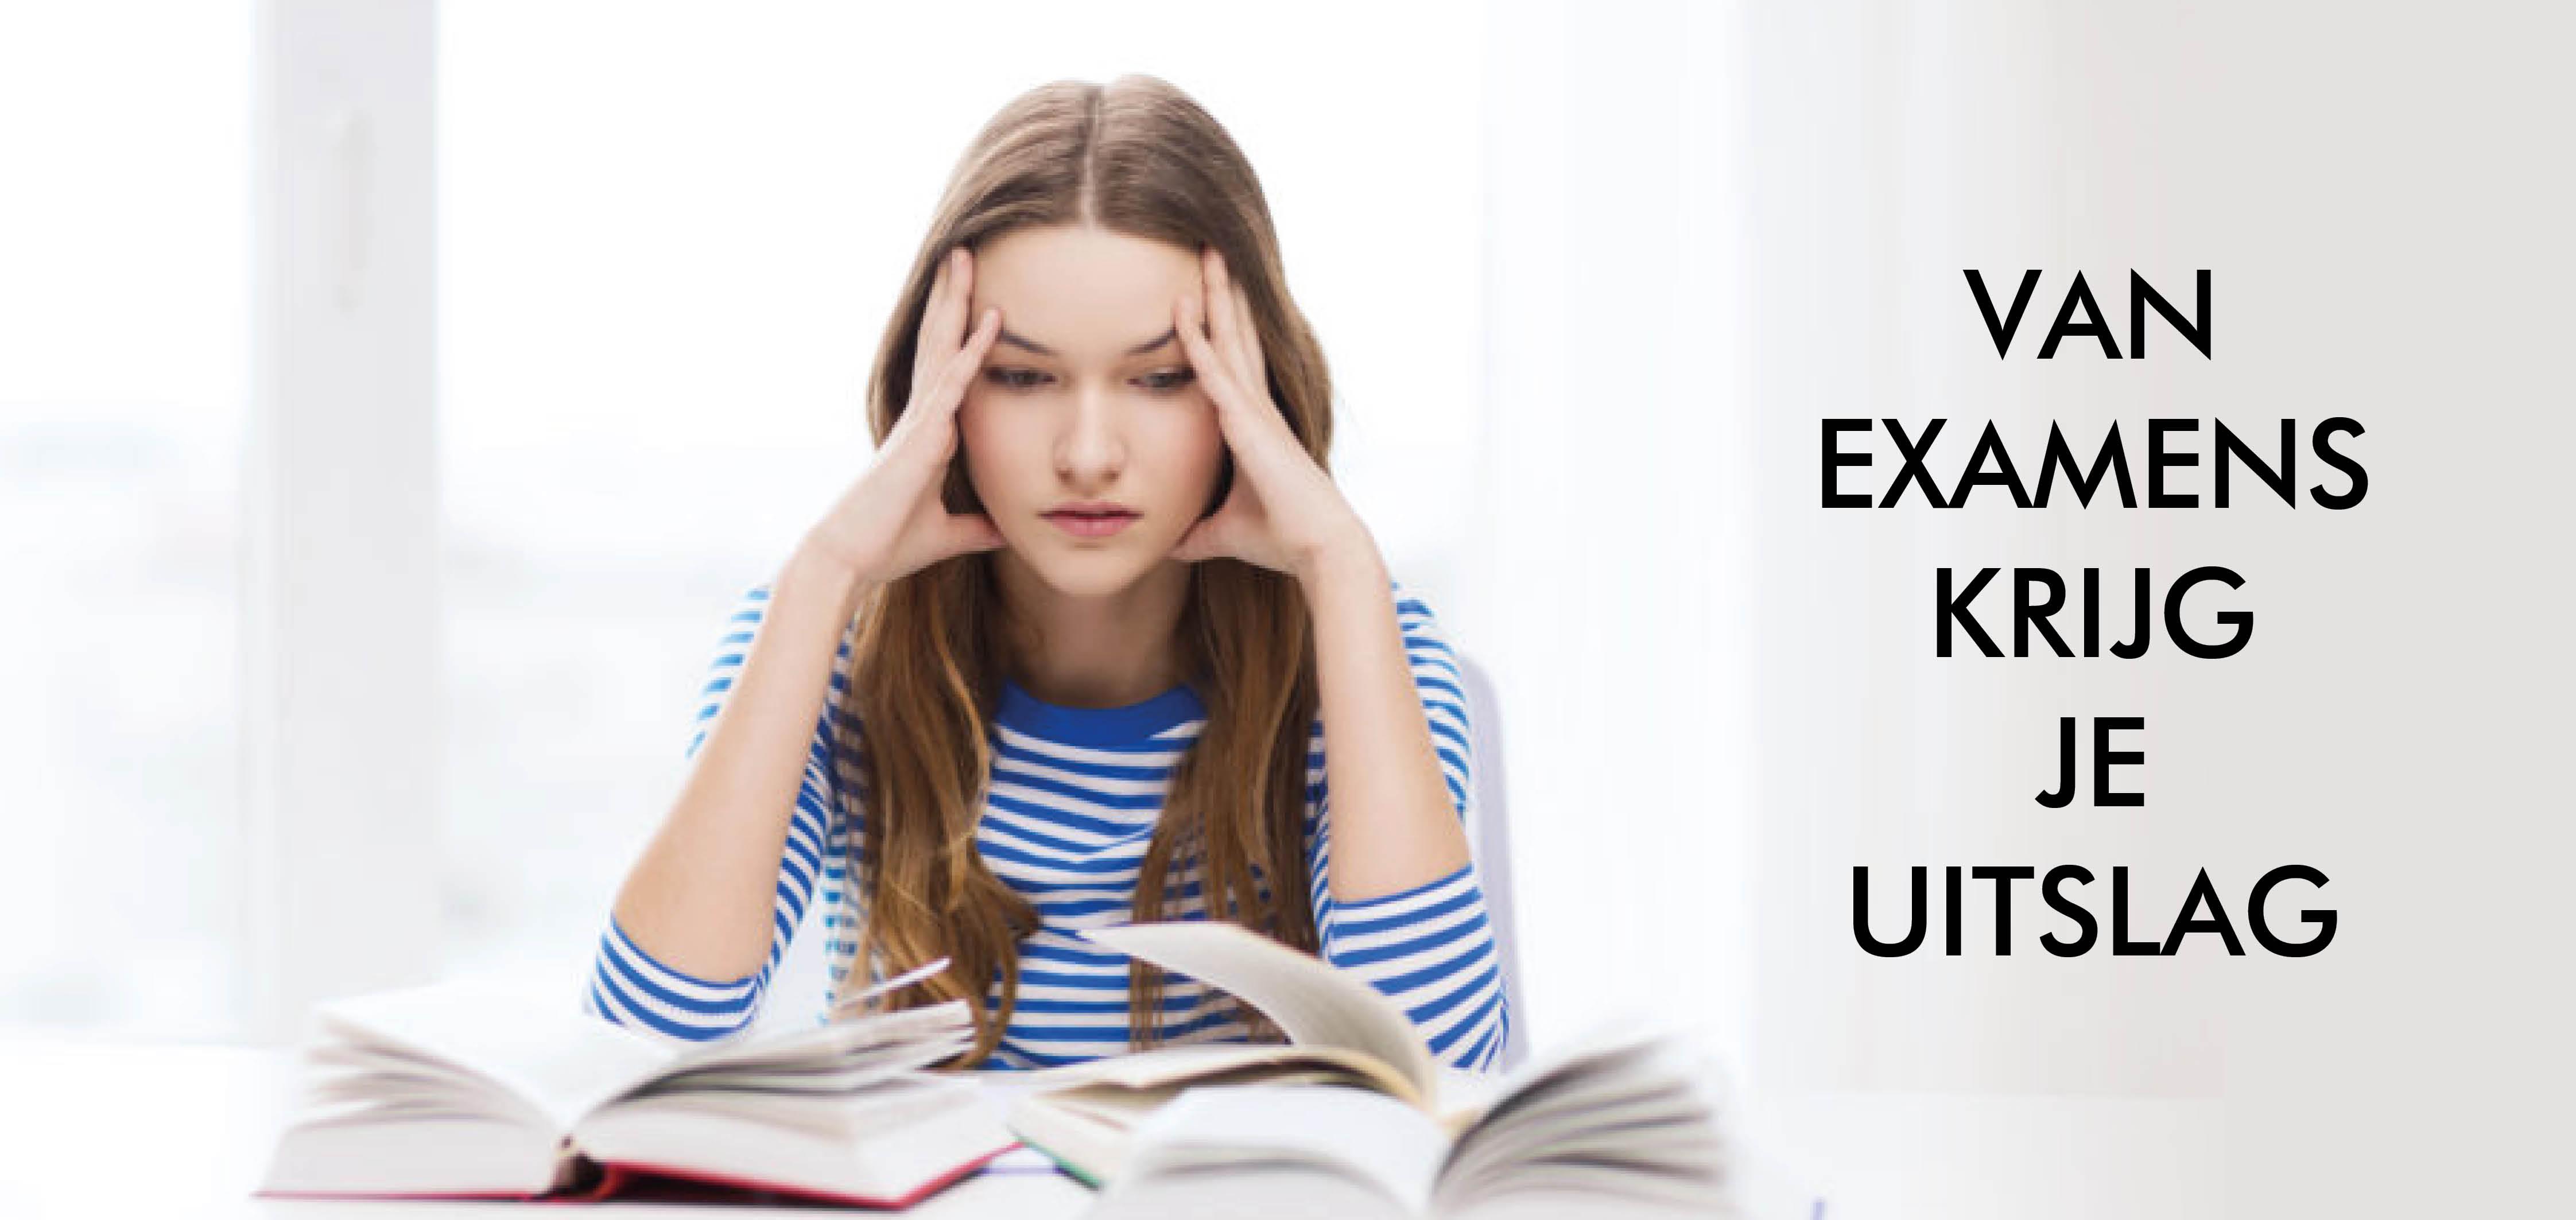 Bloed, Zweet en examens, Examenstress